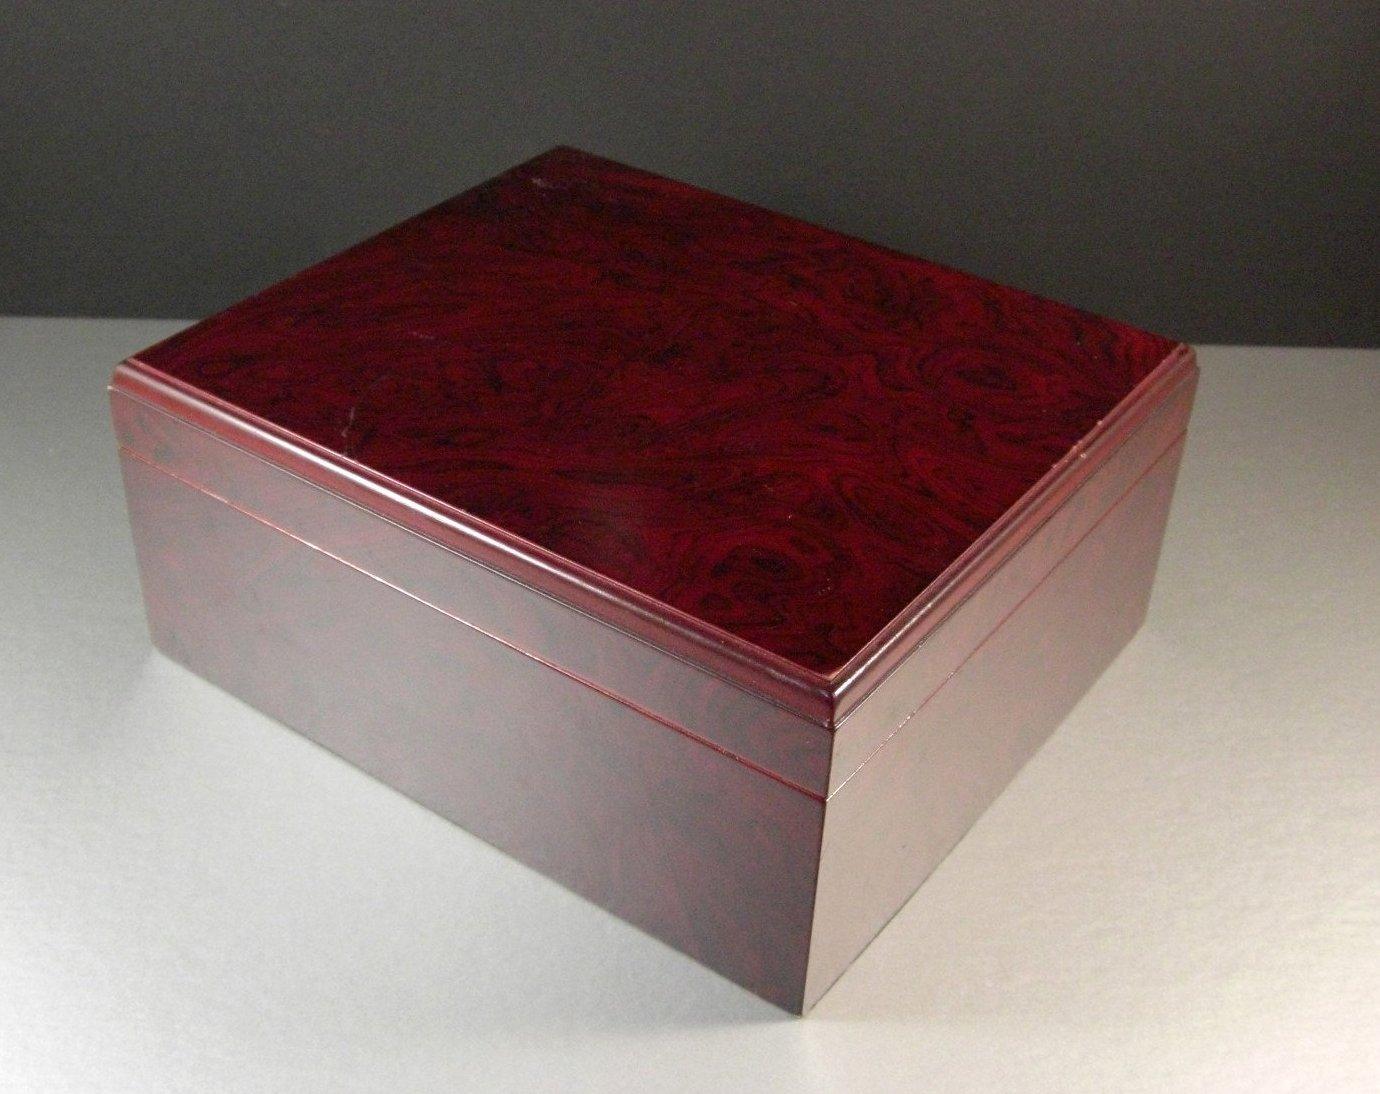 Vintage Cedar Lined Cigar Tobacco Humidor Stash Box with a Cherry Wood Finish